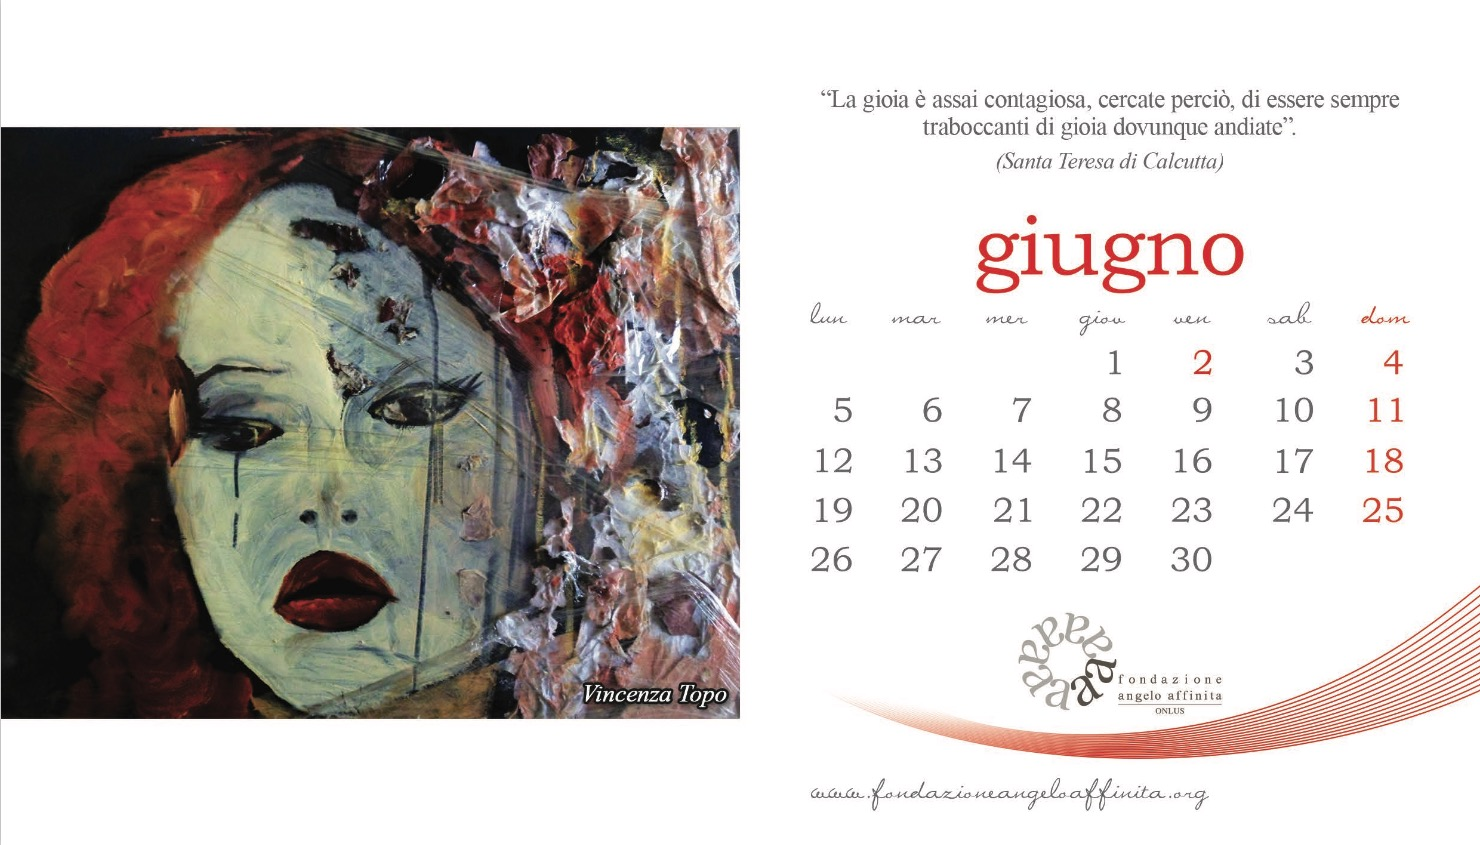 calendario-2017-fondazione-angelo-affinita_7